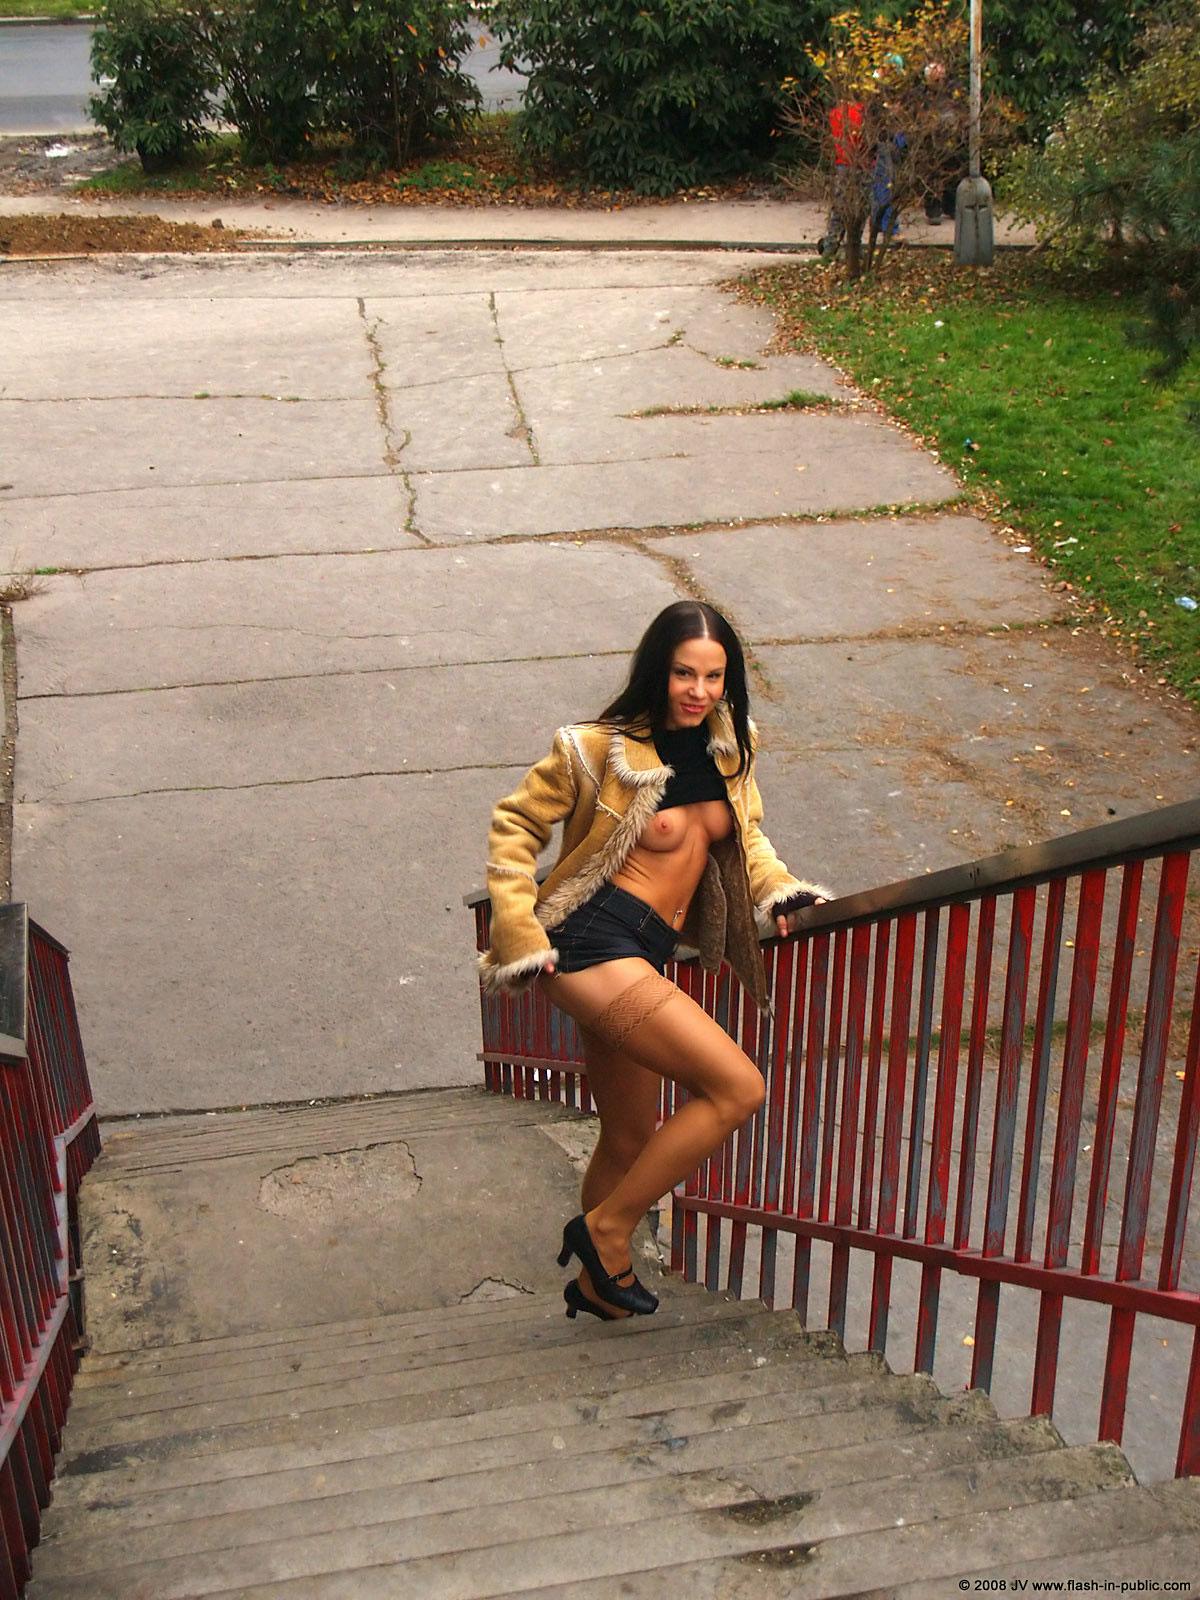 alexandra-g-bottomless-stockings-flash-in-public-18